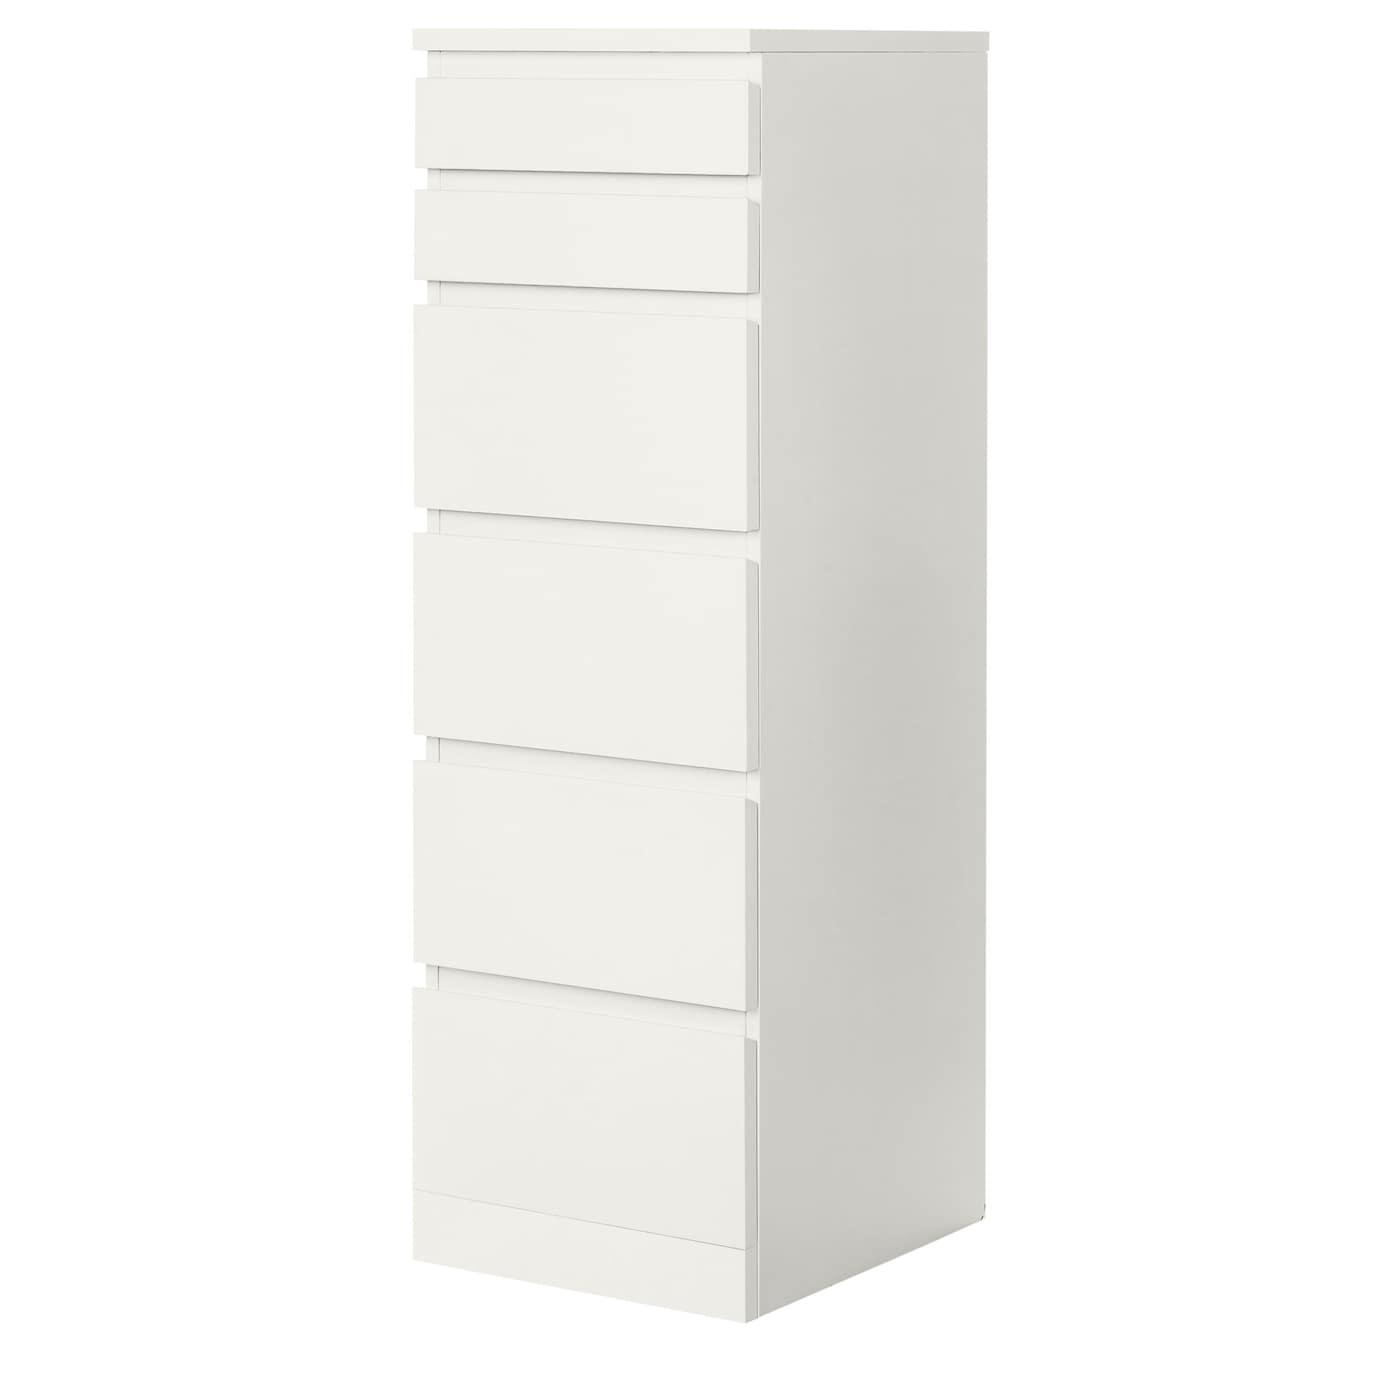 Ikea Wohnzimmer Kommode